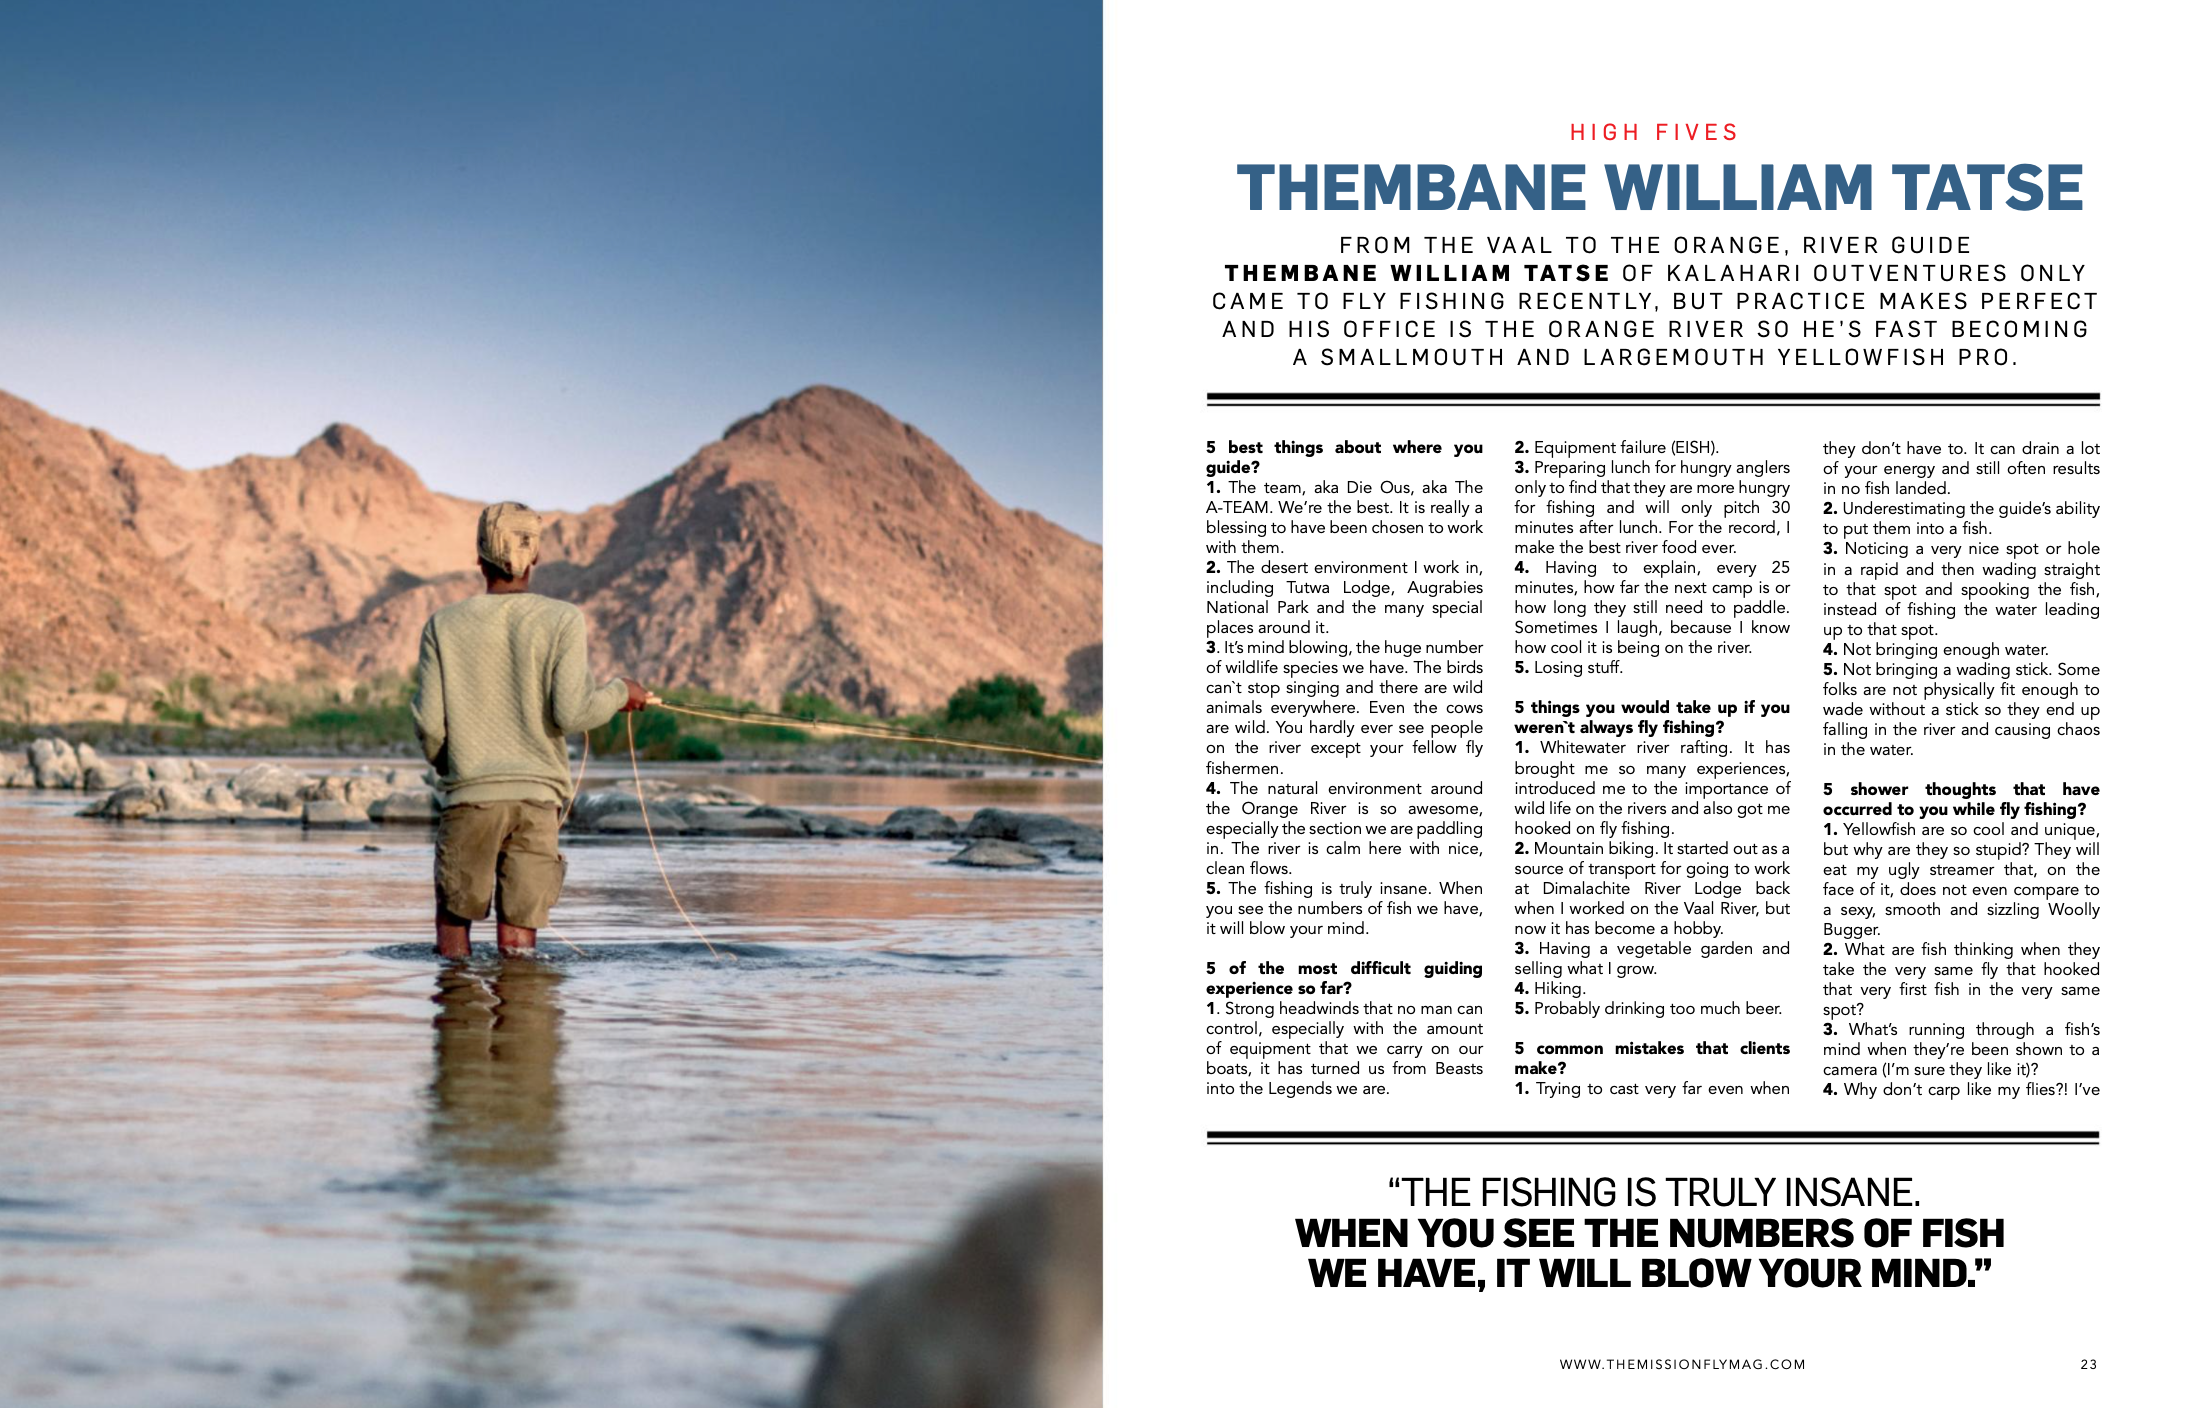 Thembane